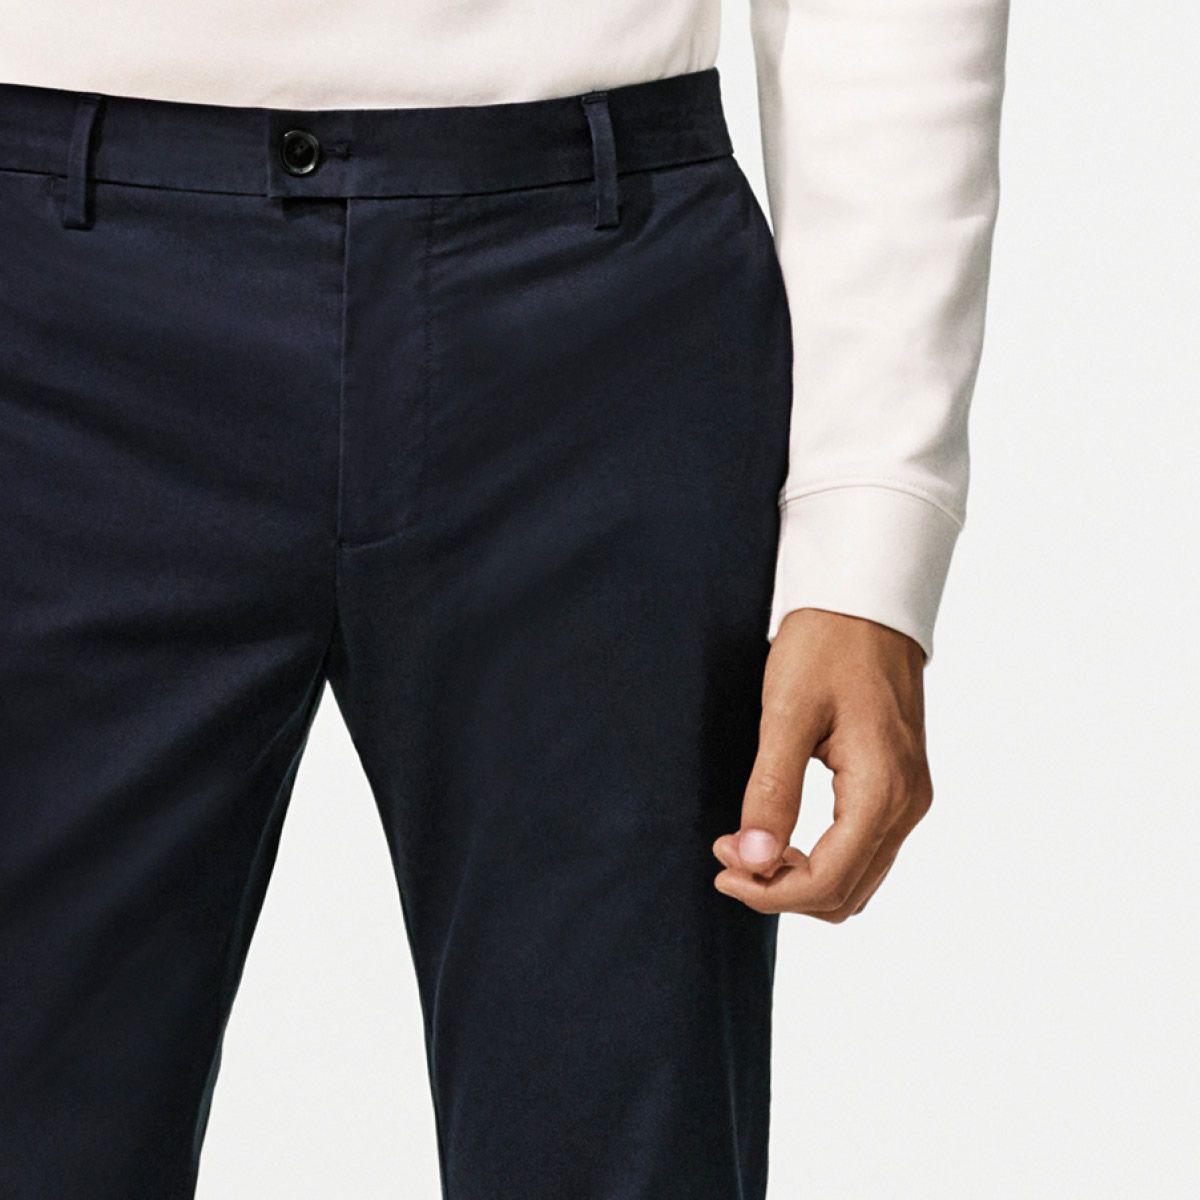 aa8bbb6e758 Calvin Klein Men s Pants - Macy s